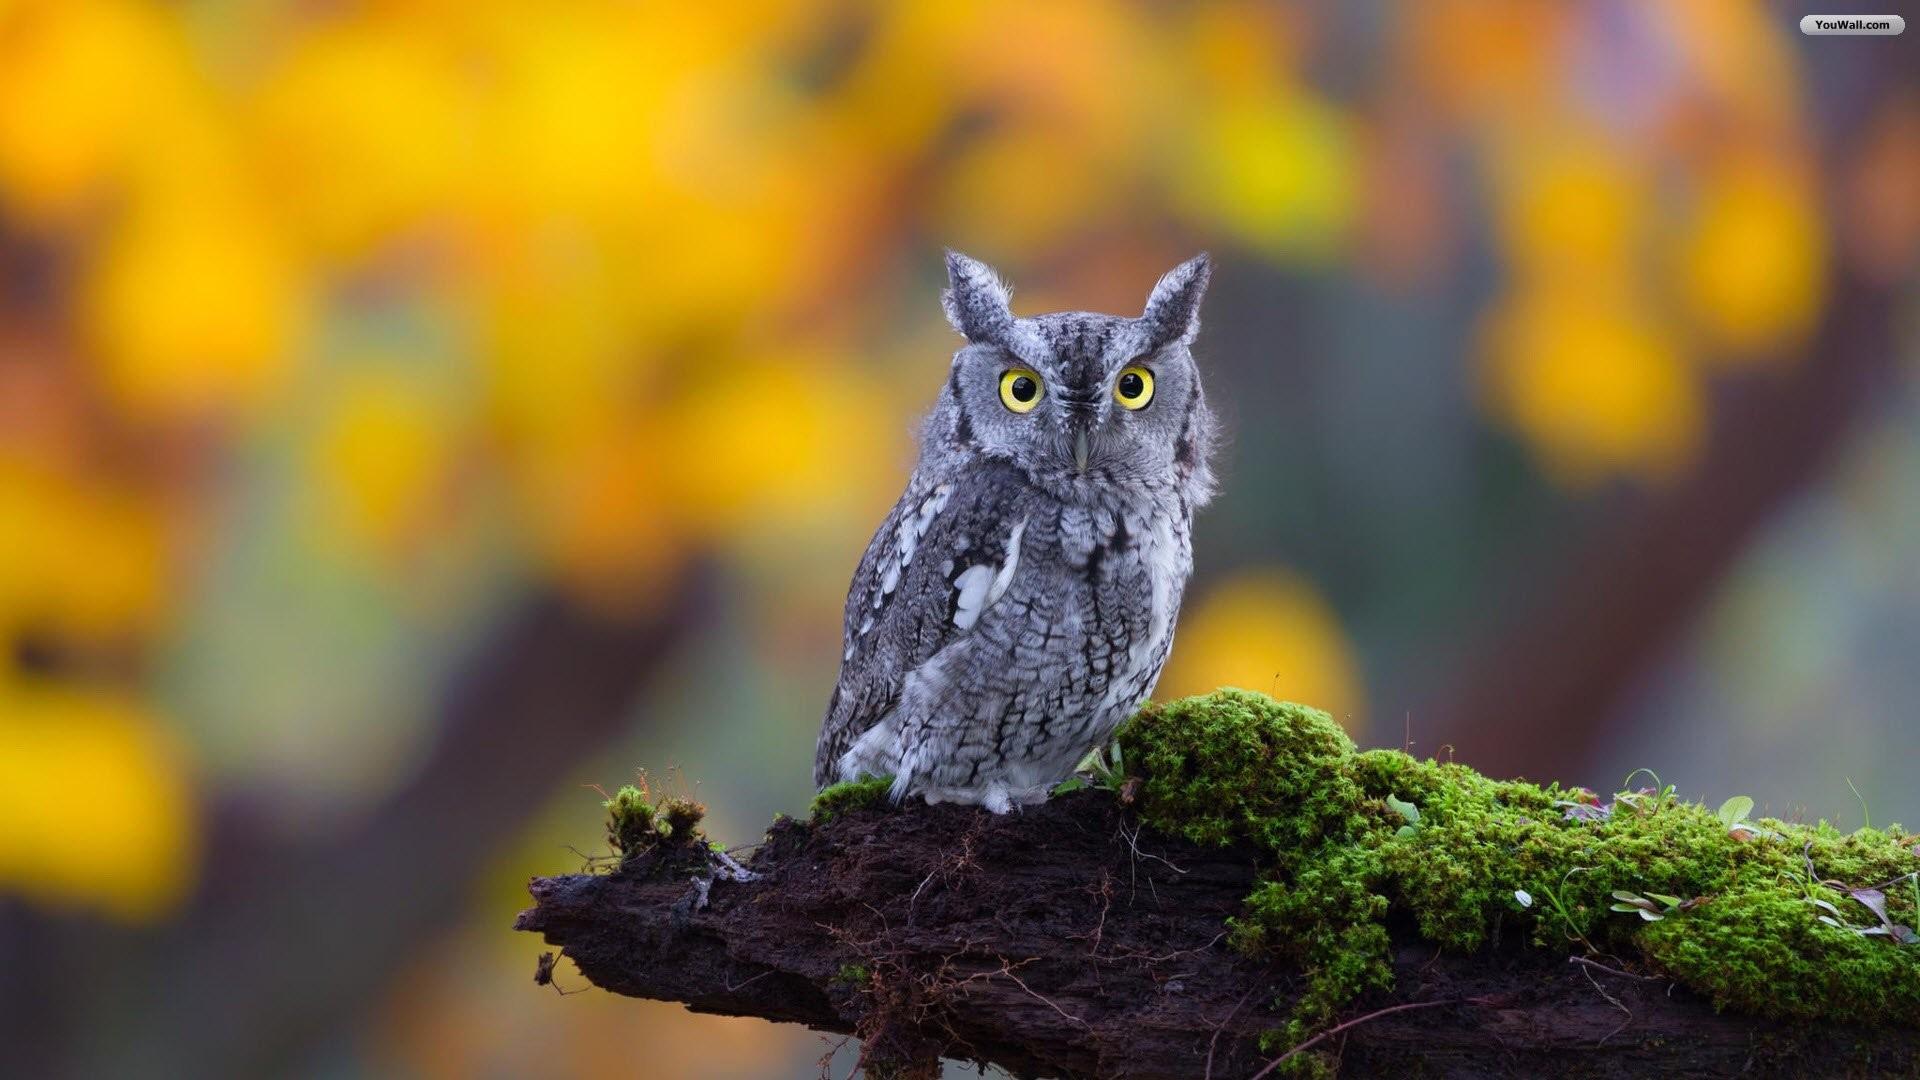 Silver Owl Wallpaper